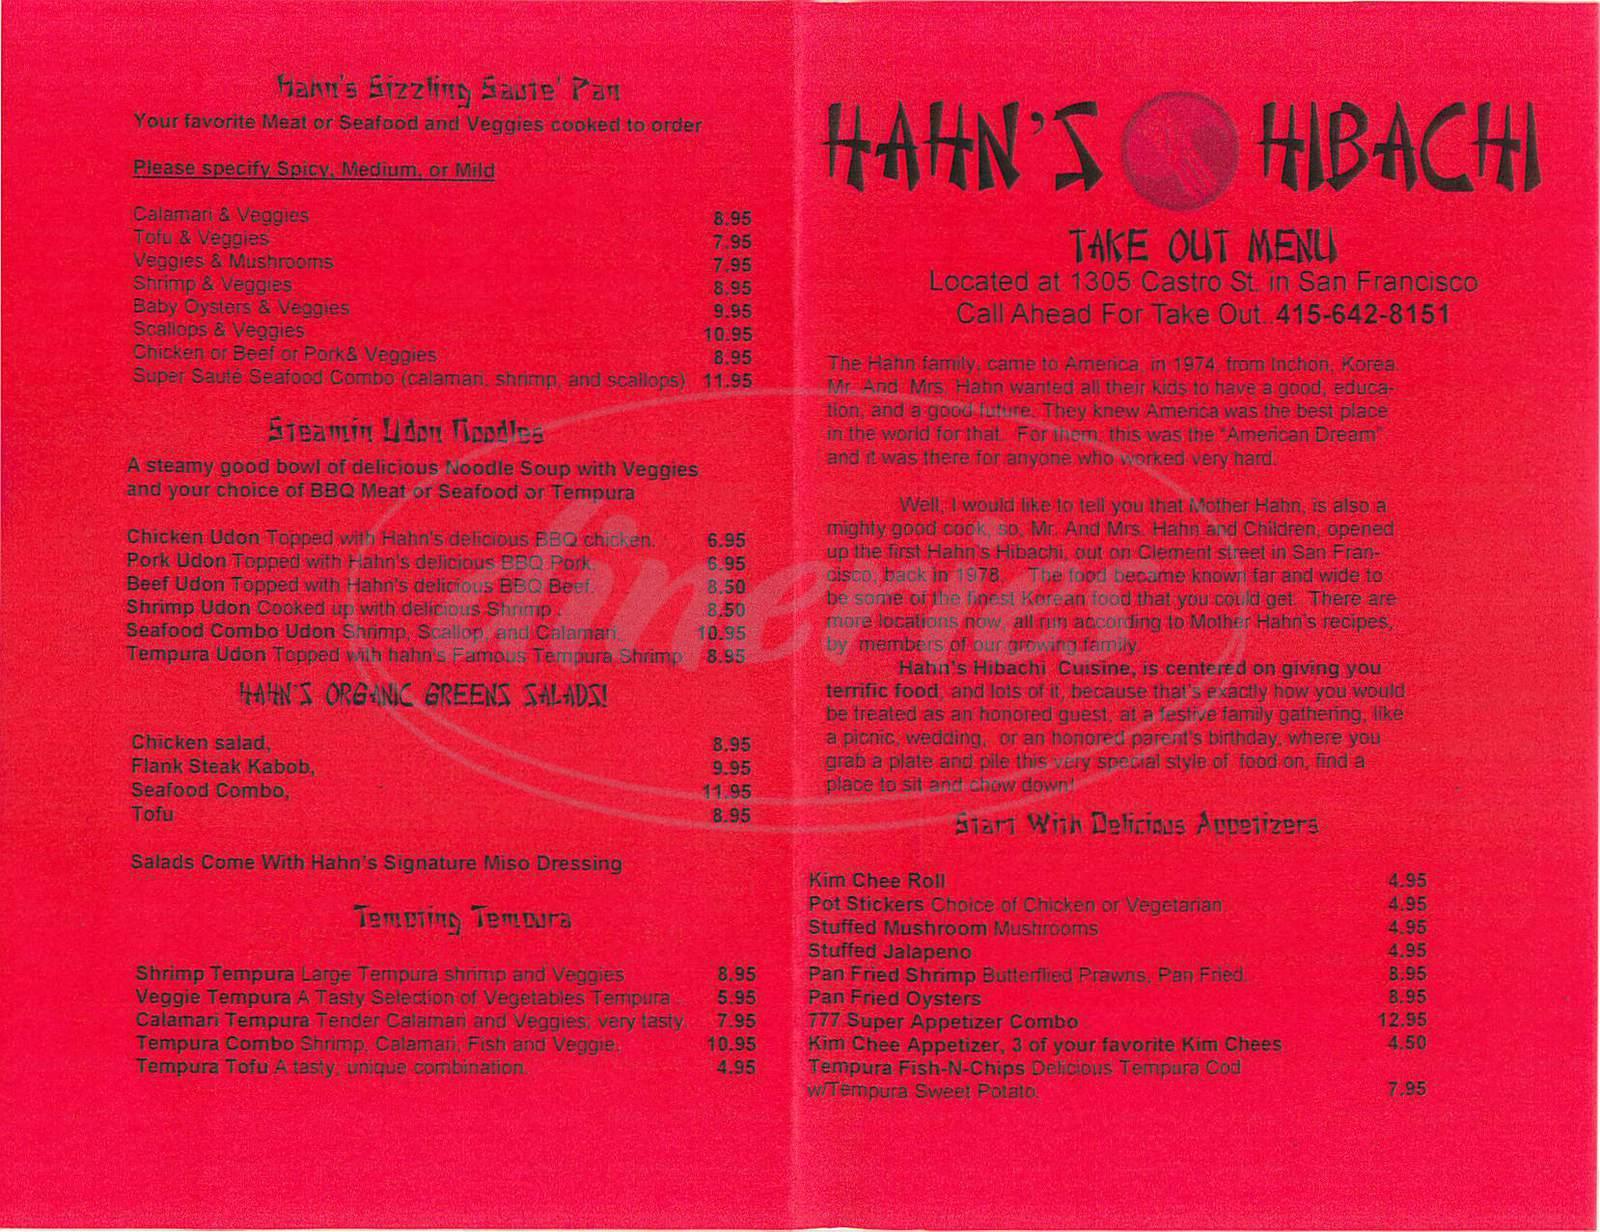 menu for Hahn's Hibachi